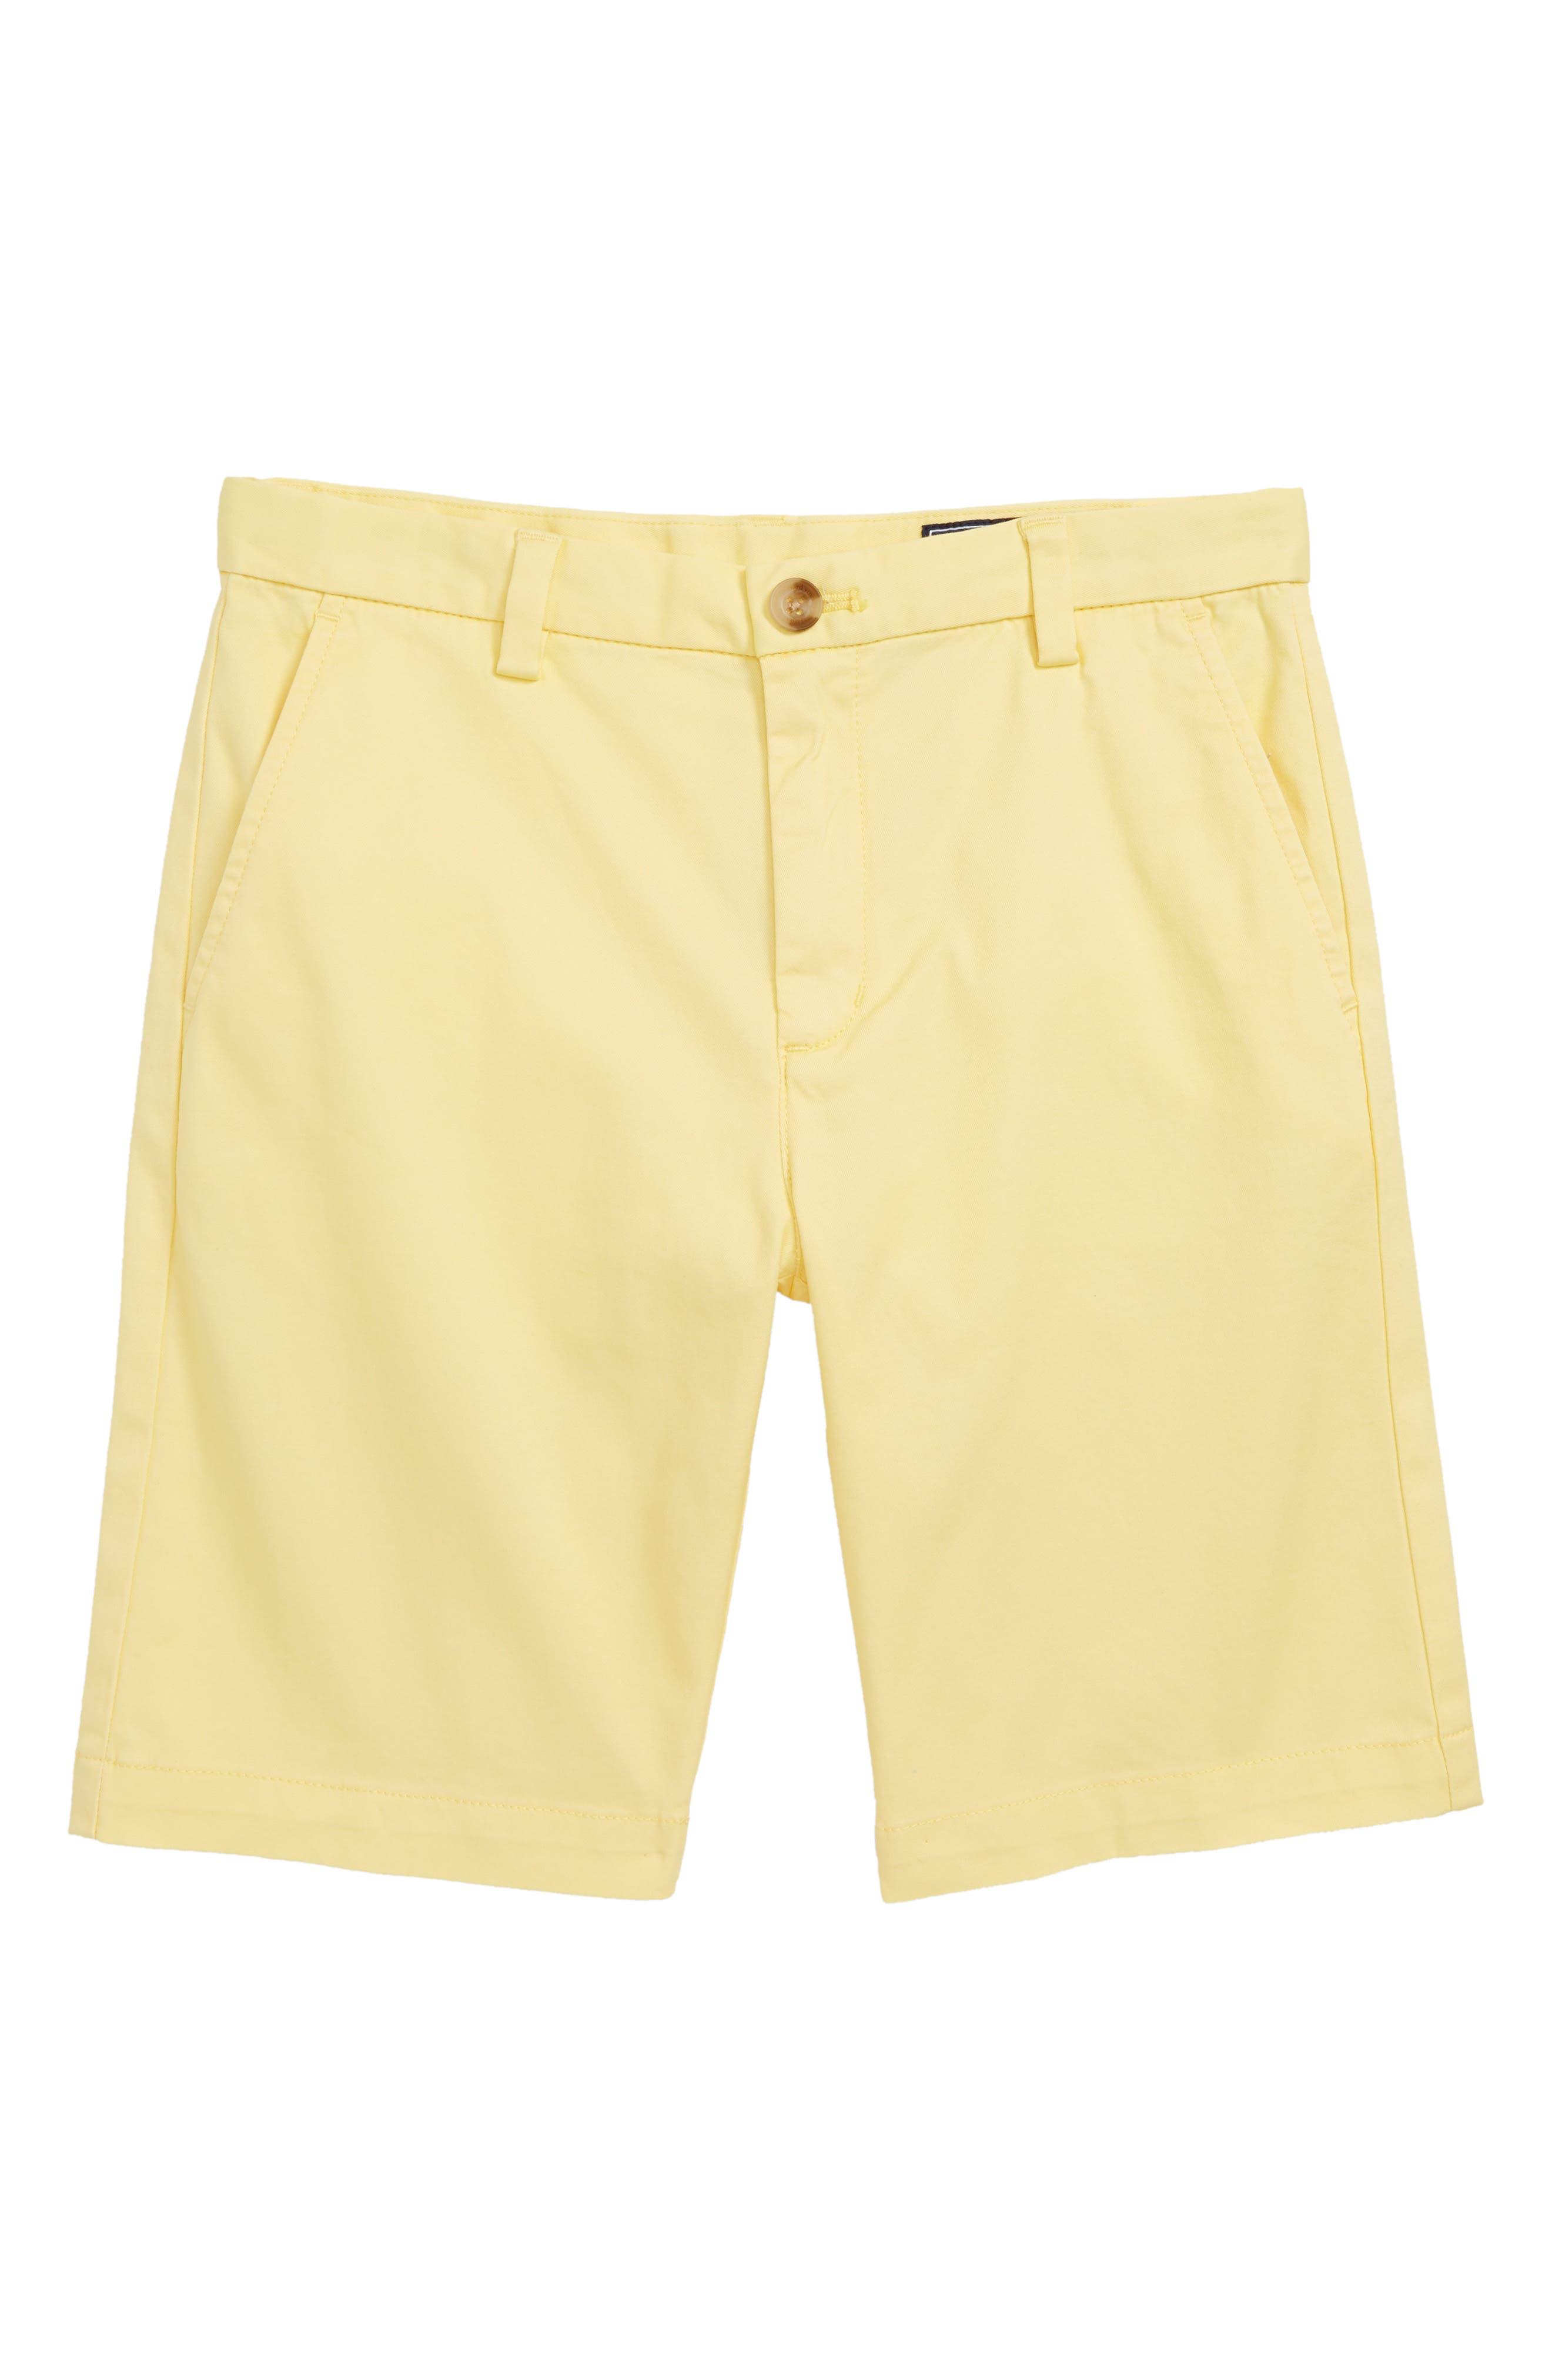 Stretch Breaker Shorts,                             Main thumbnail 1, color,                             Lemon Drop